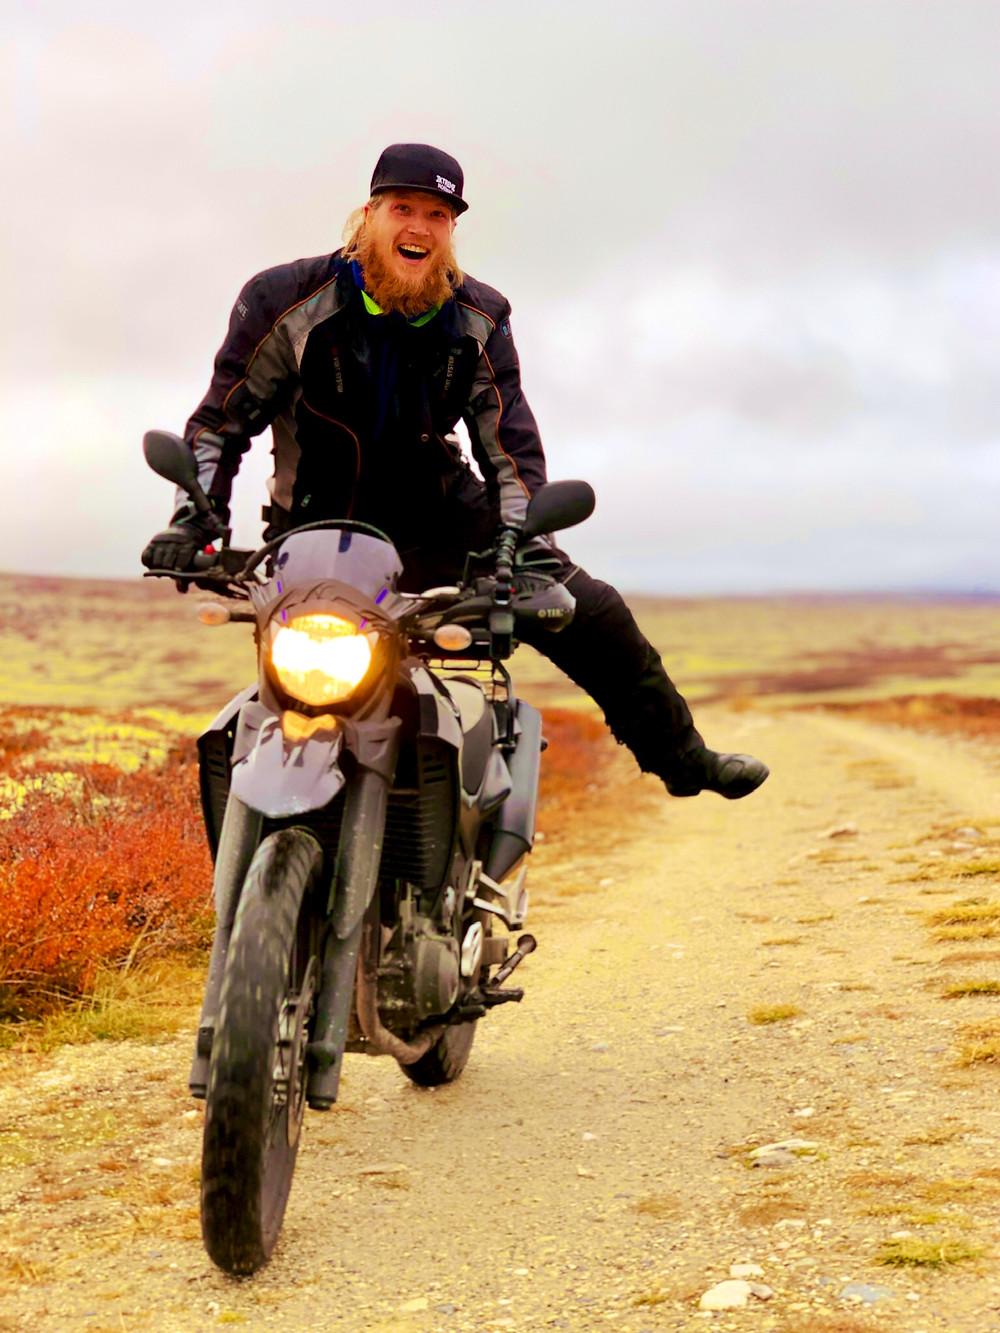 Kenneth | Ride the Bean | Yamaha XT660 | Rondane, Norway |